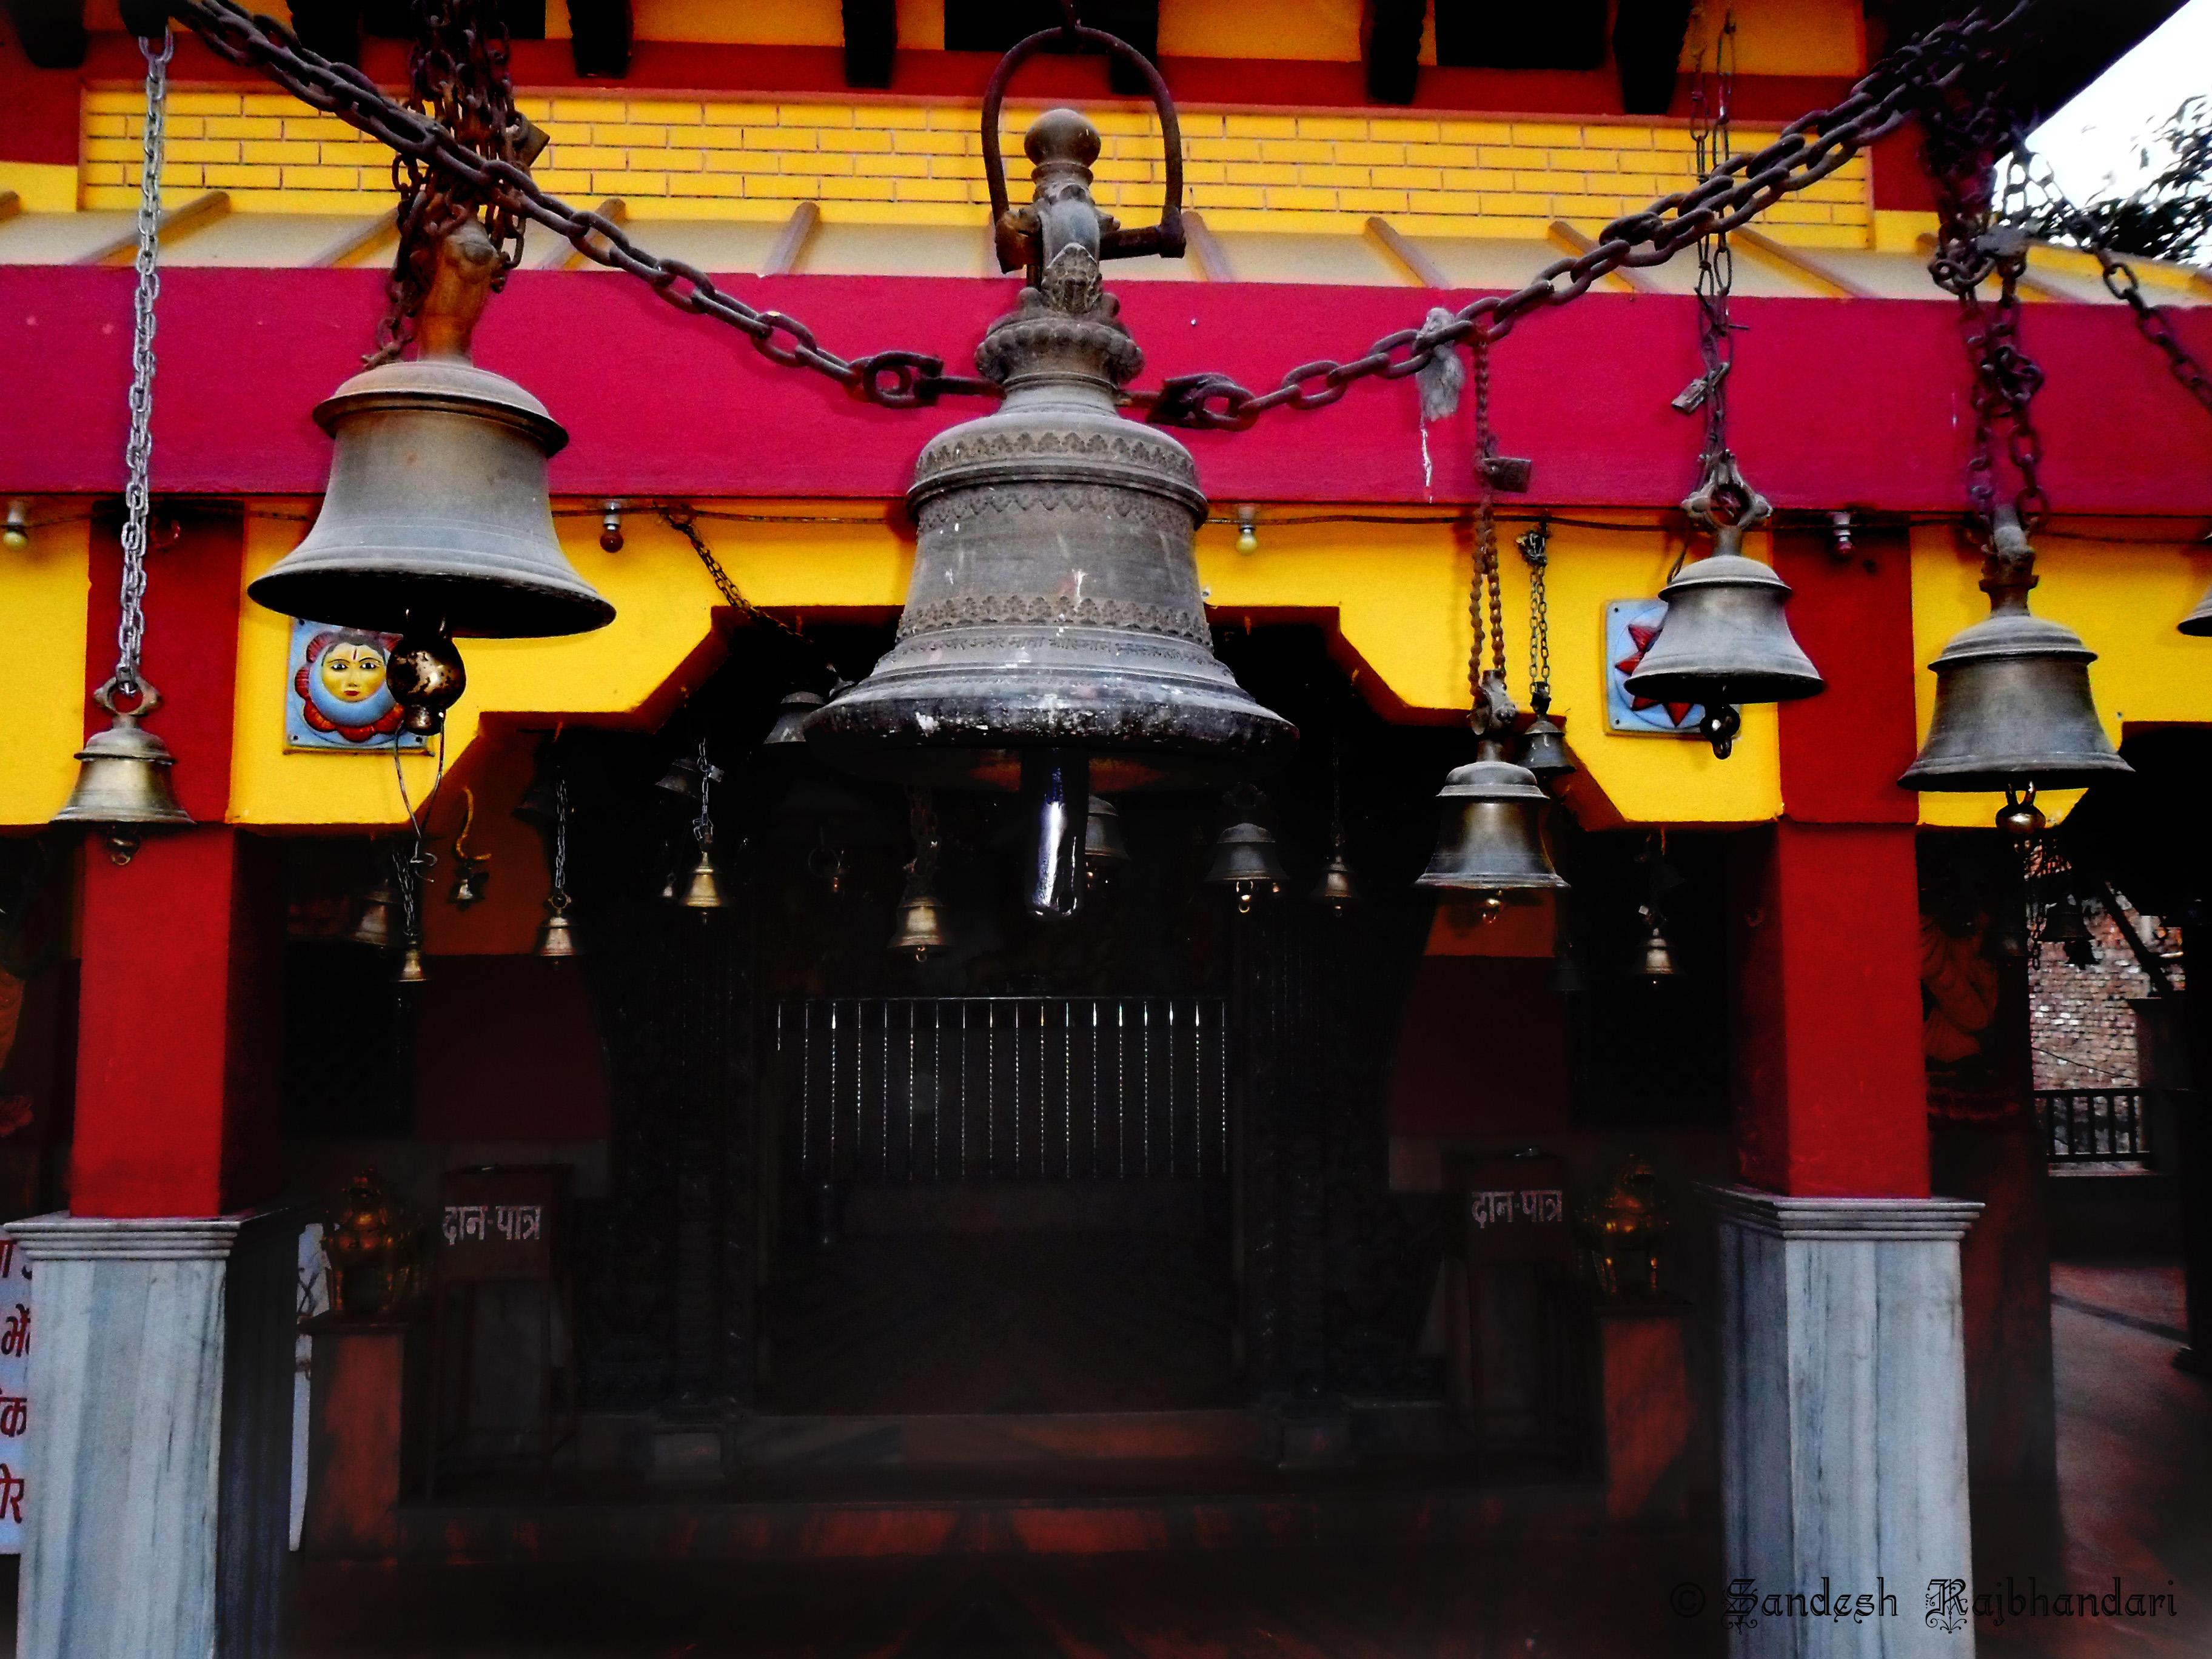 File:Kali Mandir, Biratnagar (4 March 2012) jpg - Wikimedia Commons